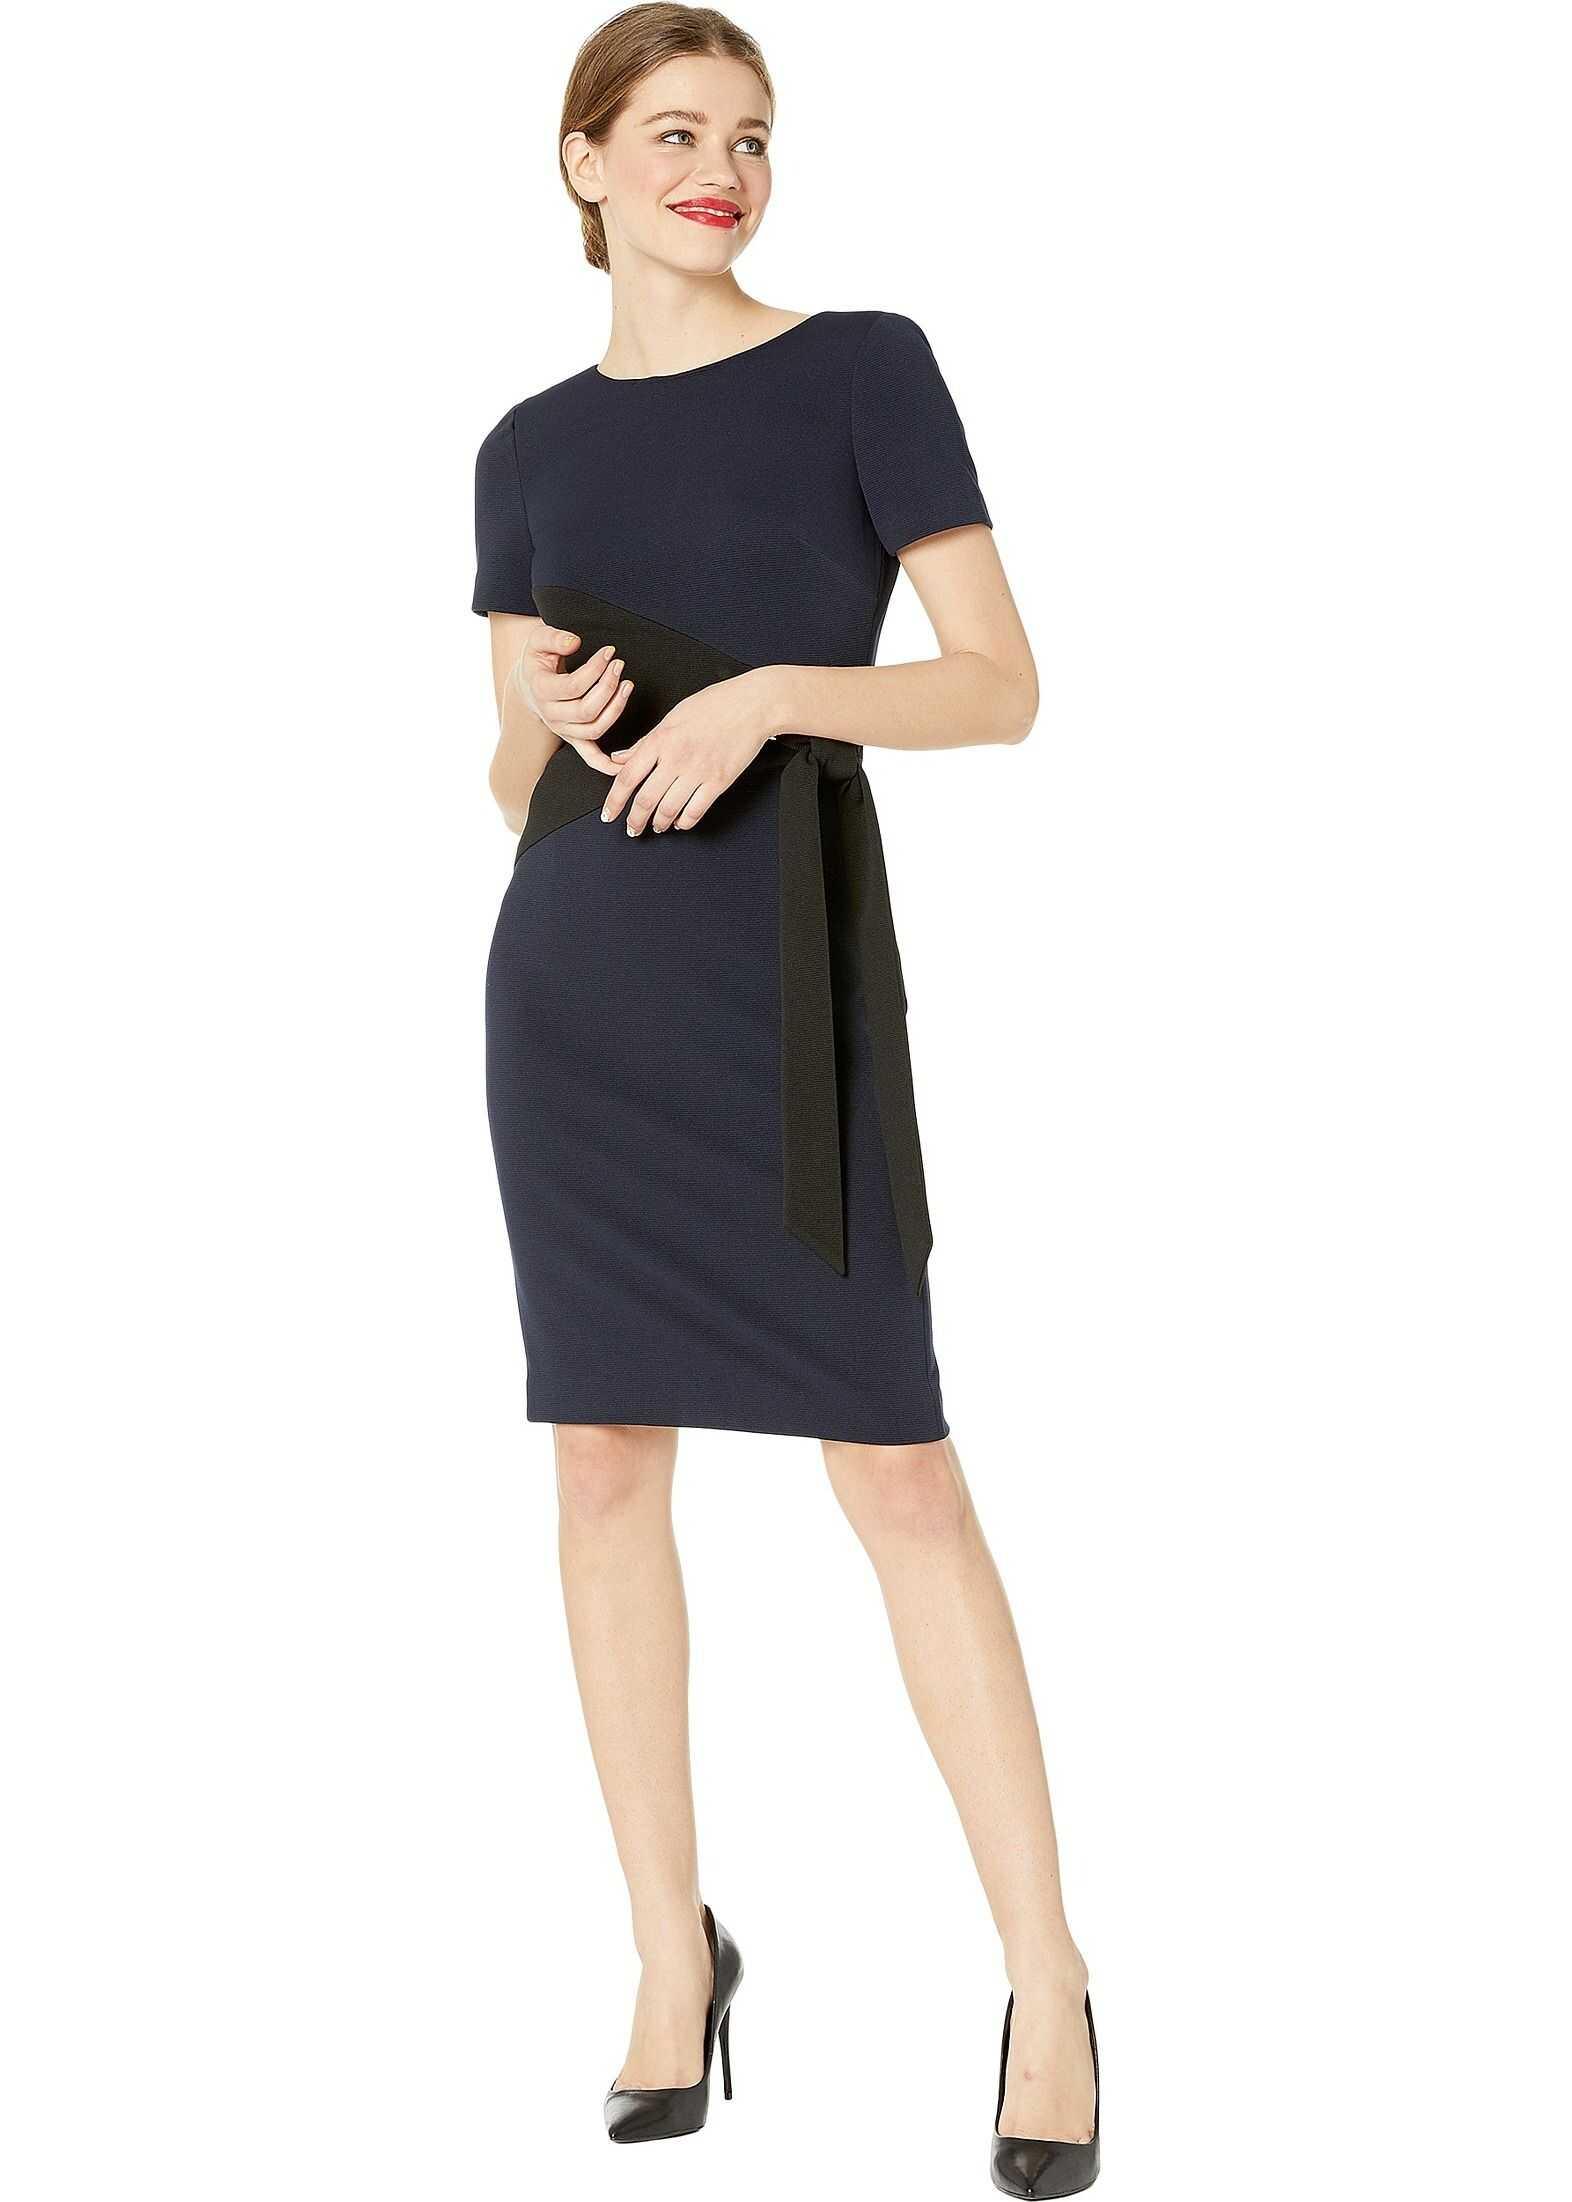 Badgley Mischka Two-Tone Stretch File Tie Front Day Dress Navy/Black